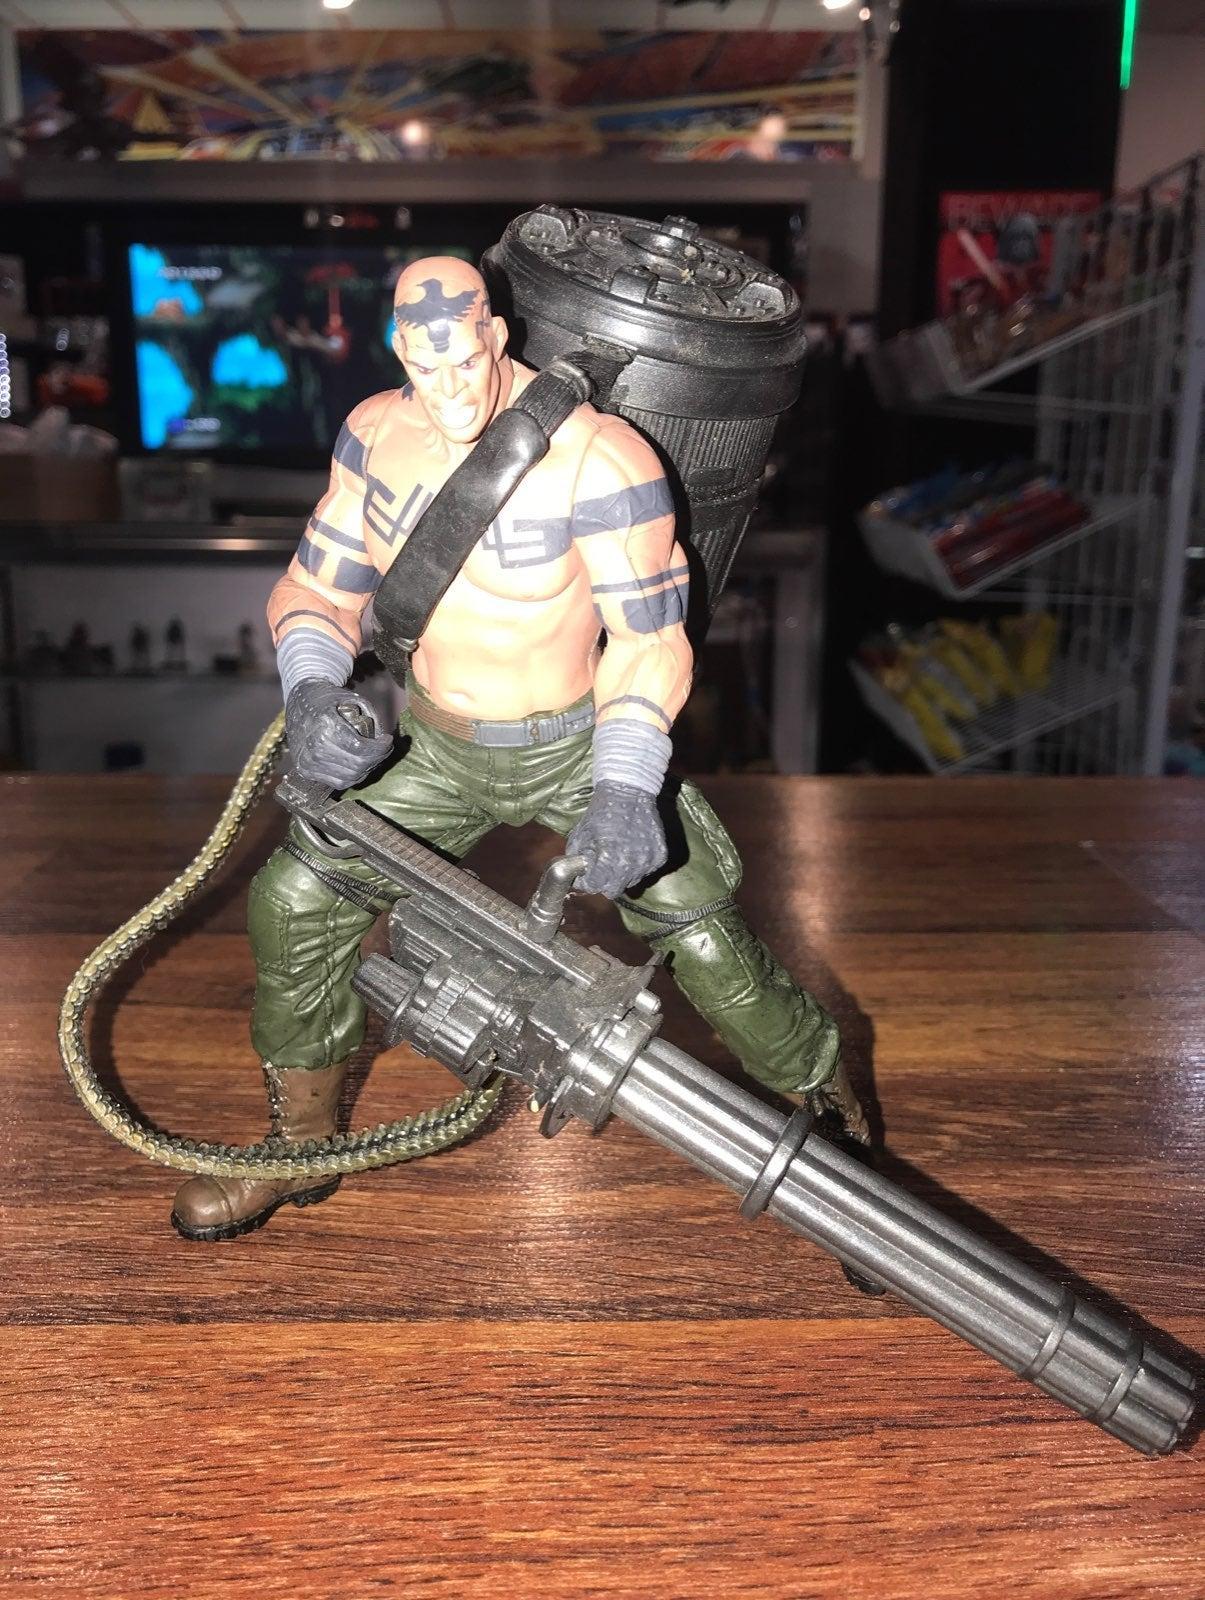 Metal Gear Solid Vulcan Raven Action Figure McFarlane Toys 1998 Konami S11 for sale online